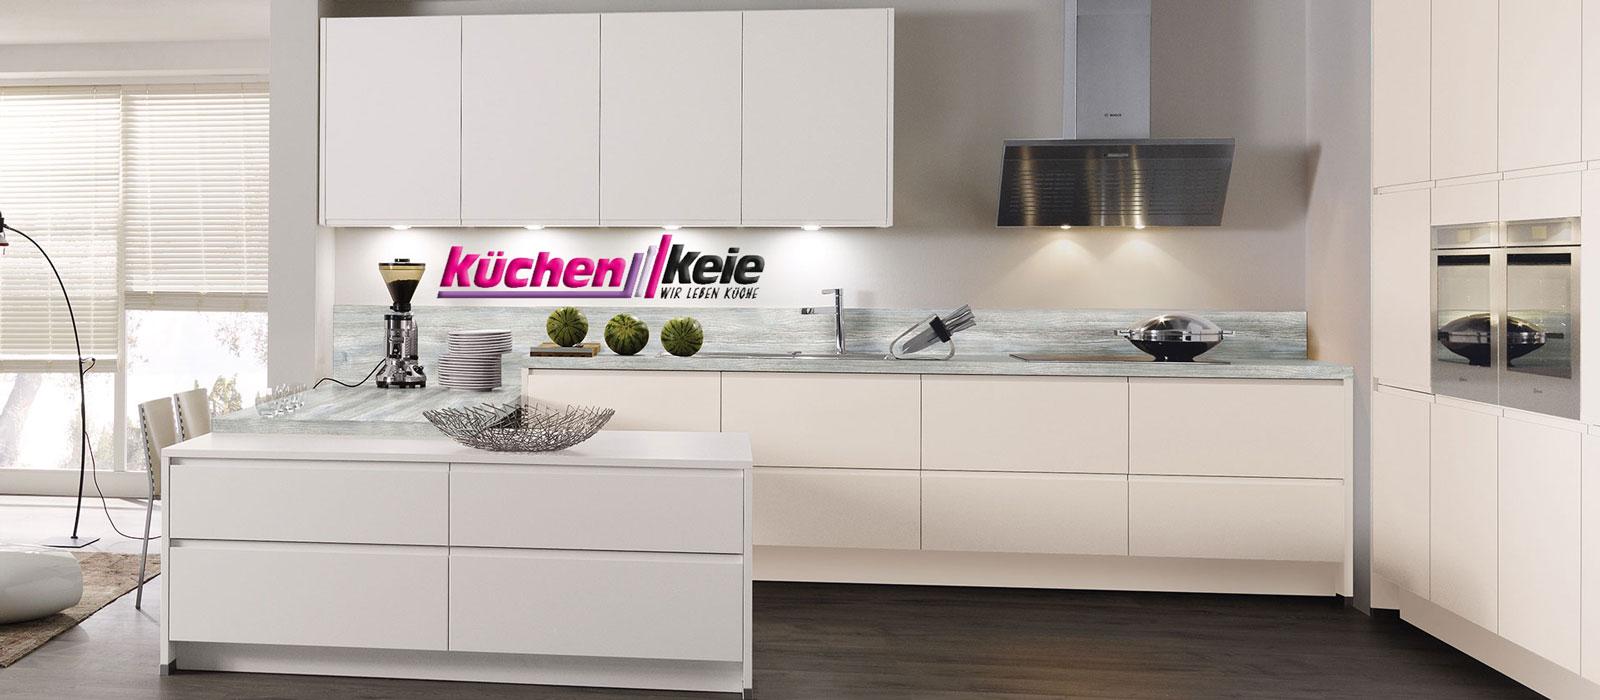 kuechenguide.com-kuechen-keie-banner